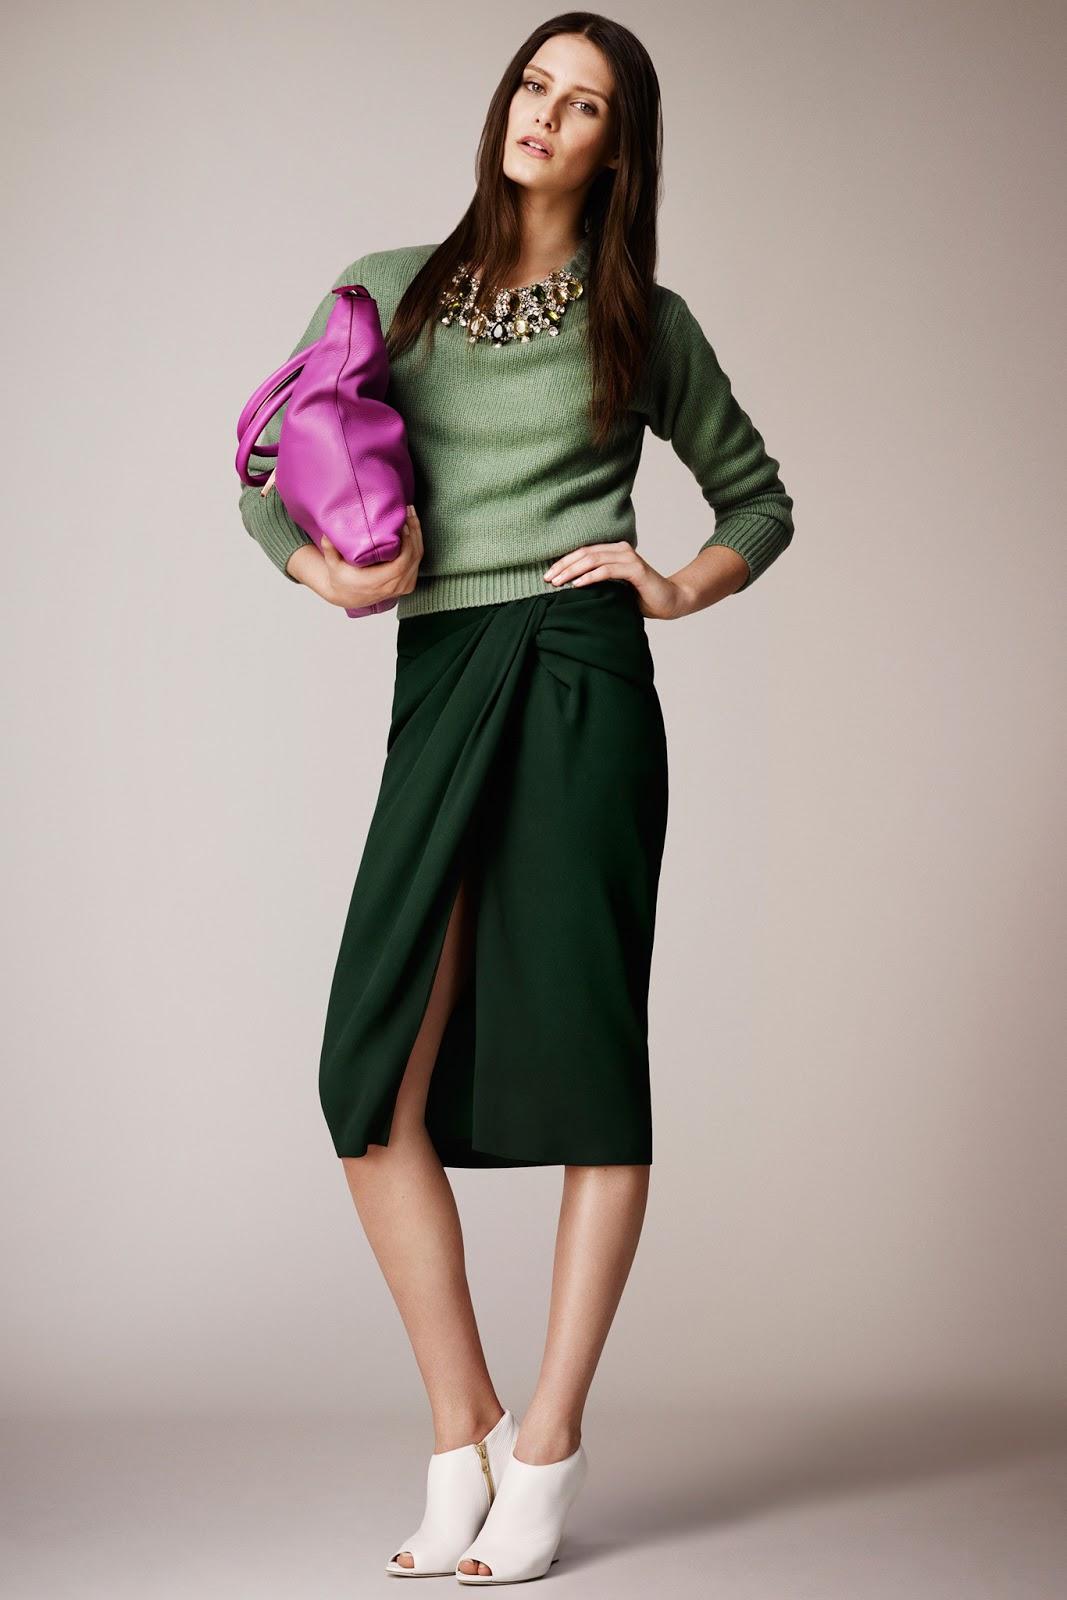 Burberry Prorsum Resort 2014 via fashioned by love / british fashion blog